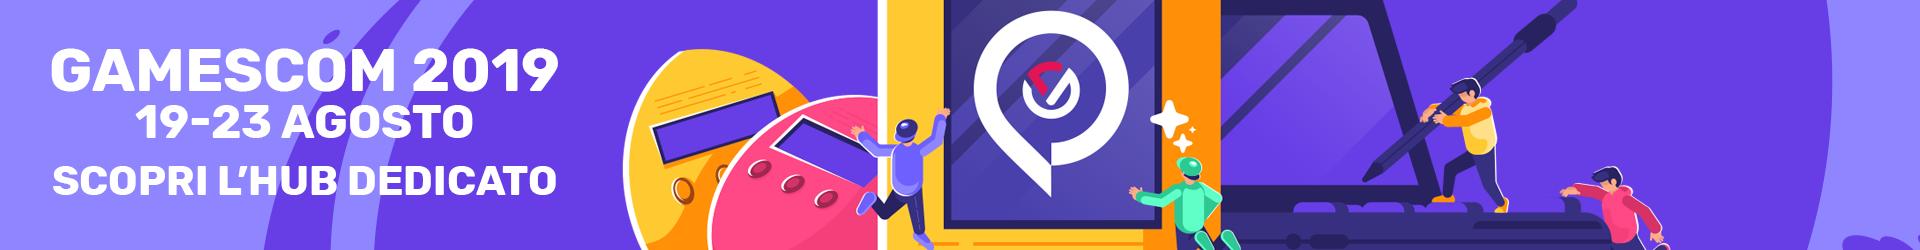 Gamescom 2019 Hub